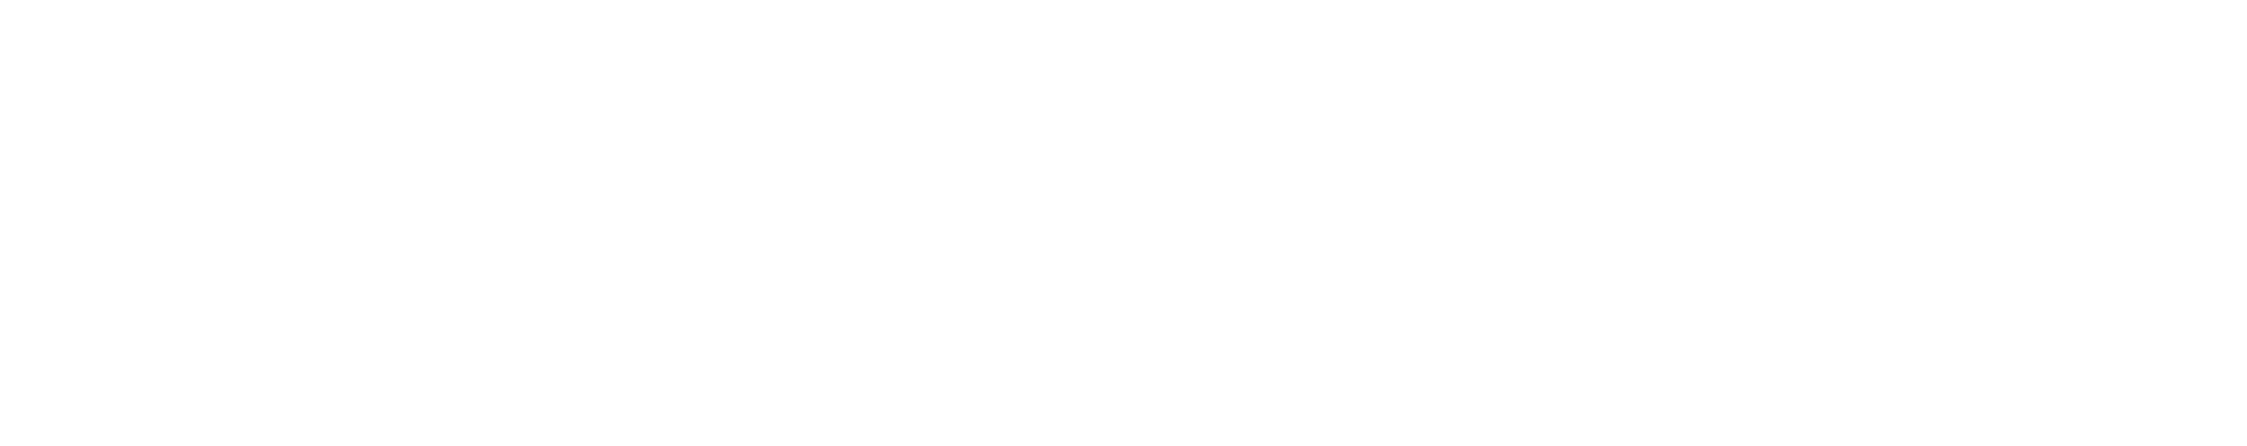 fourthFLOOR Logo_white-2.png